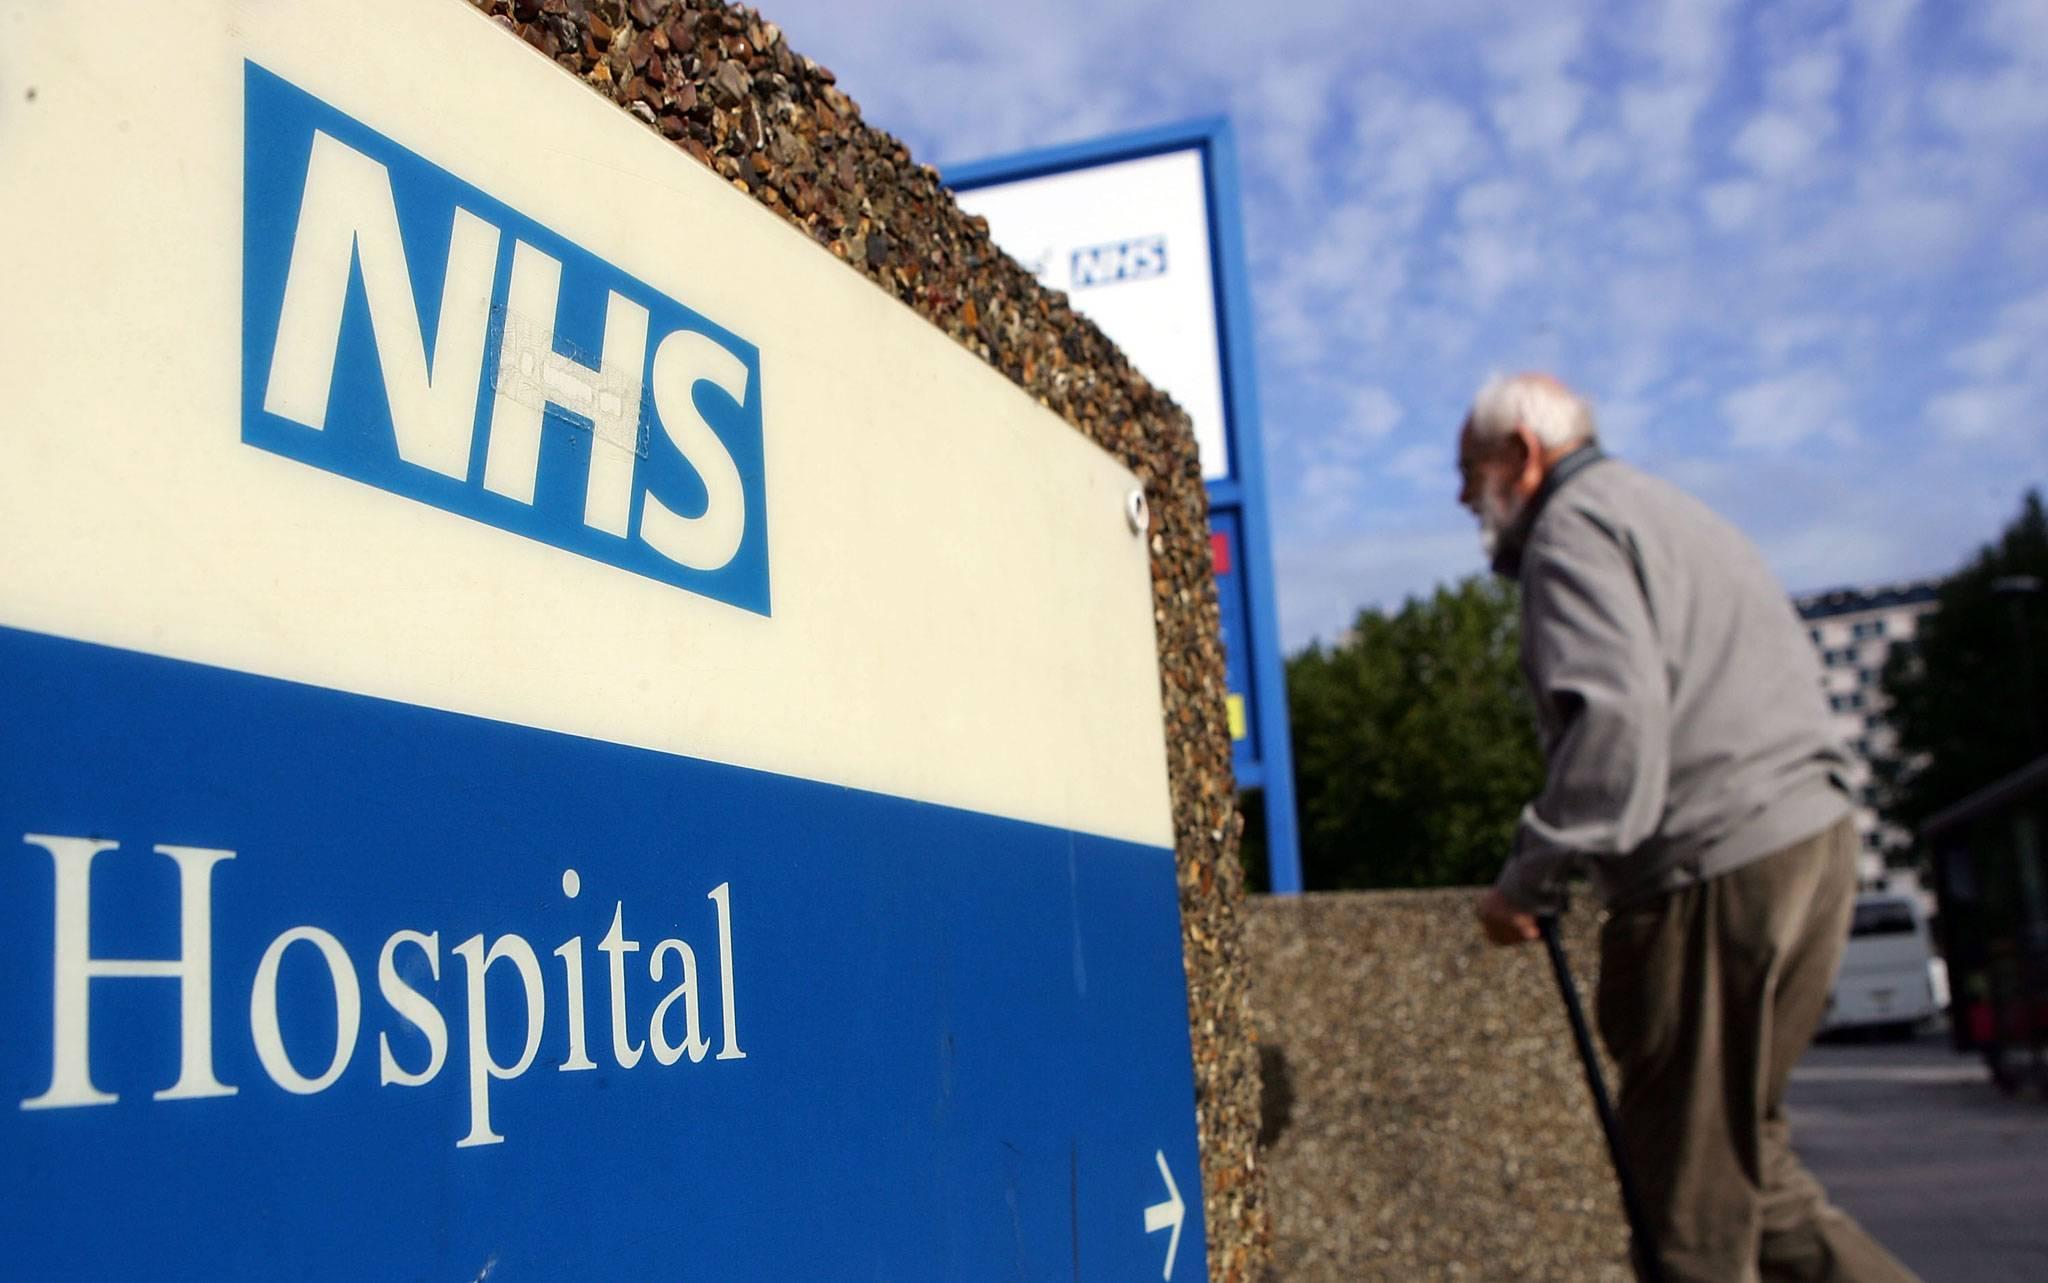 nhs_hospital.jpg